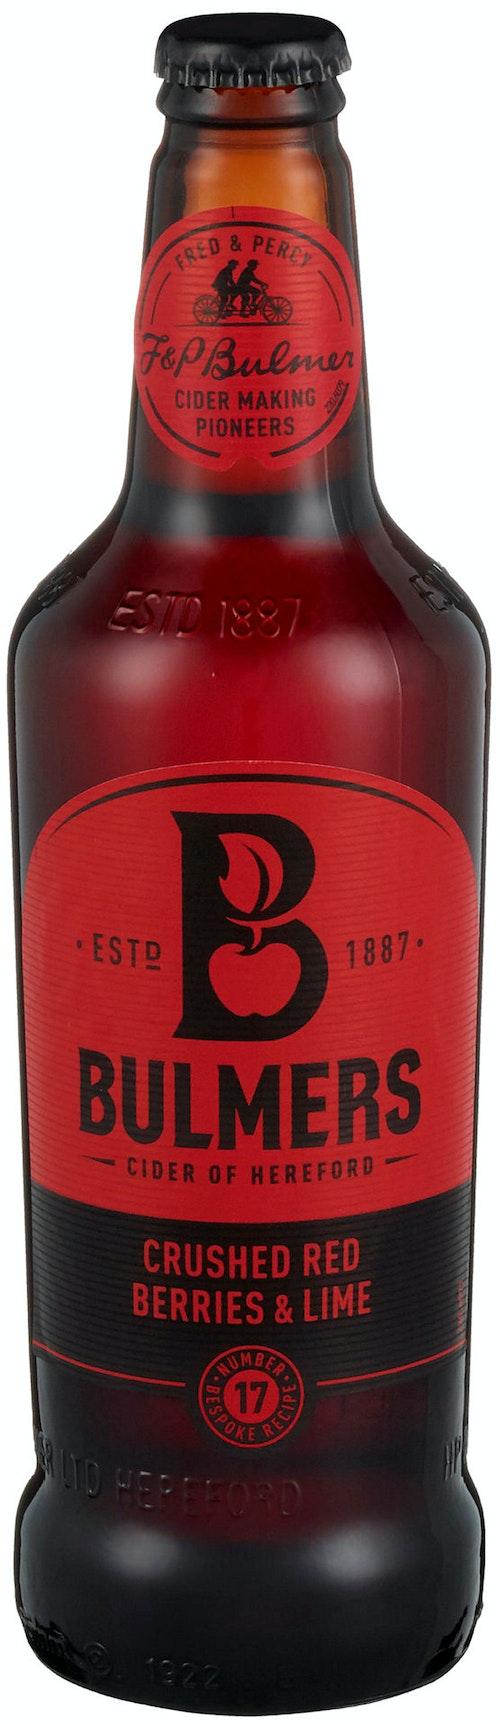 Bulmers Bulmers Crushed Red Berries & Lime 0,5 l